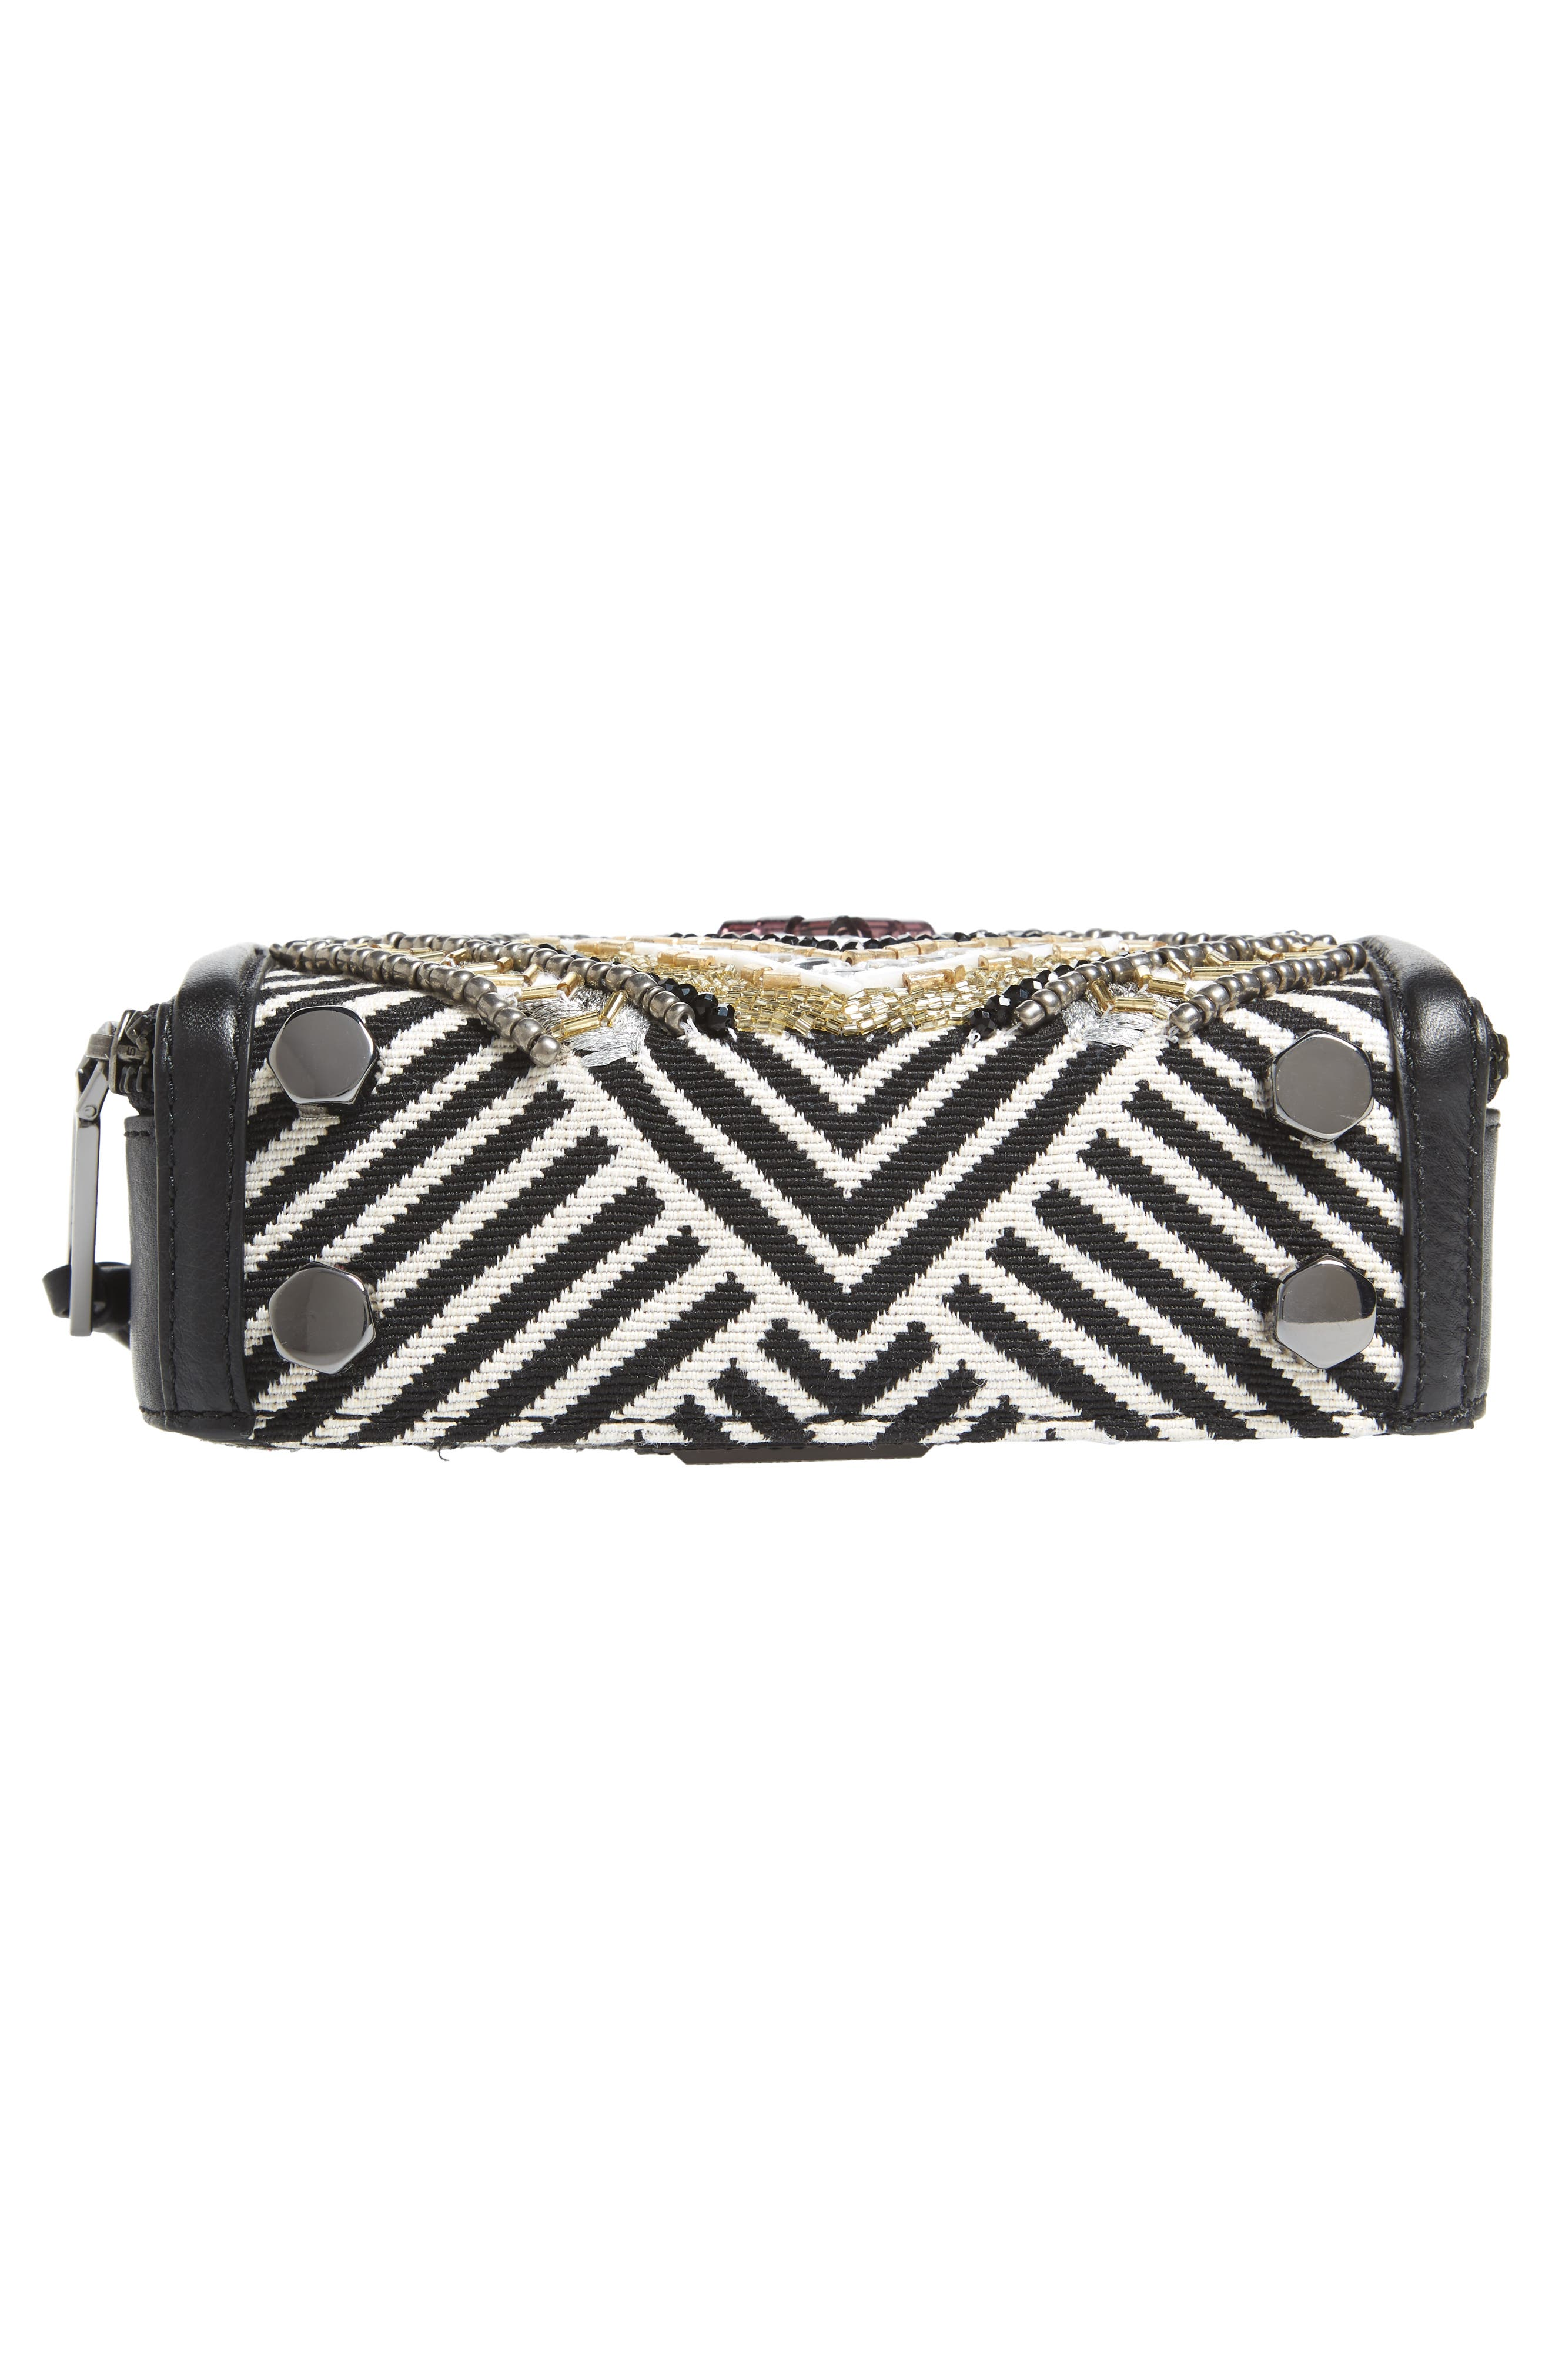 Wonder Box Embellished Crossbody Bag,                             Alternate thumbnail 6, color,                             Black Metallic Multi